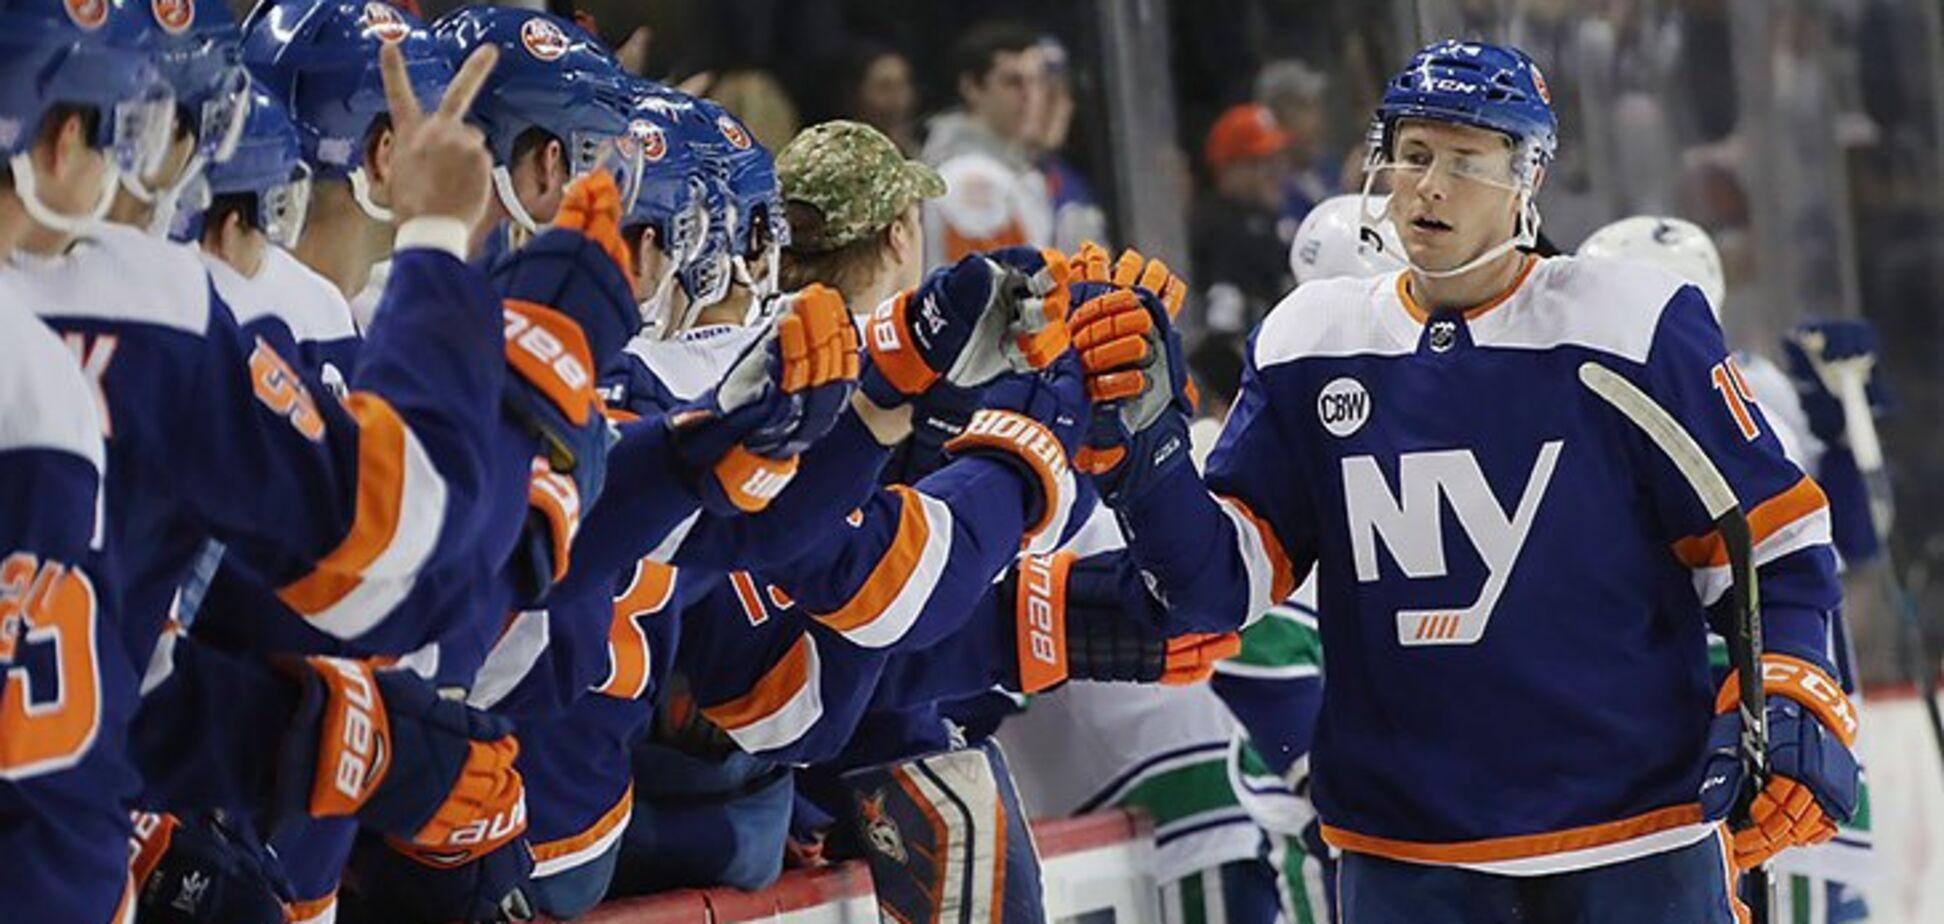 В НХЛ забили фантастический гол, повторив шедевр Овечкина